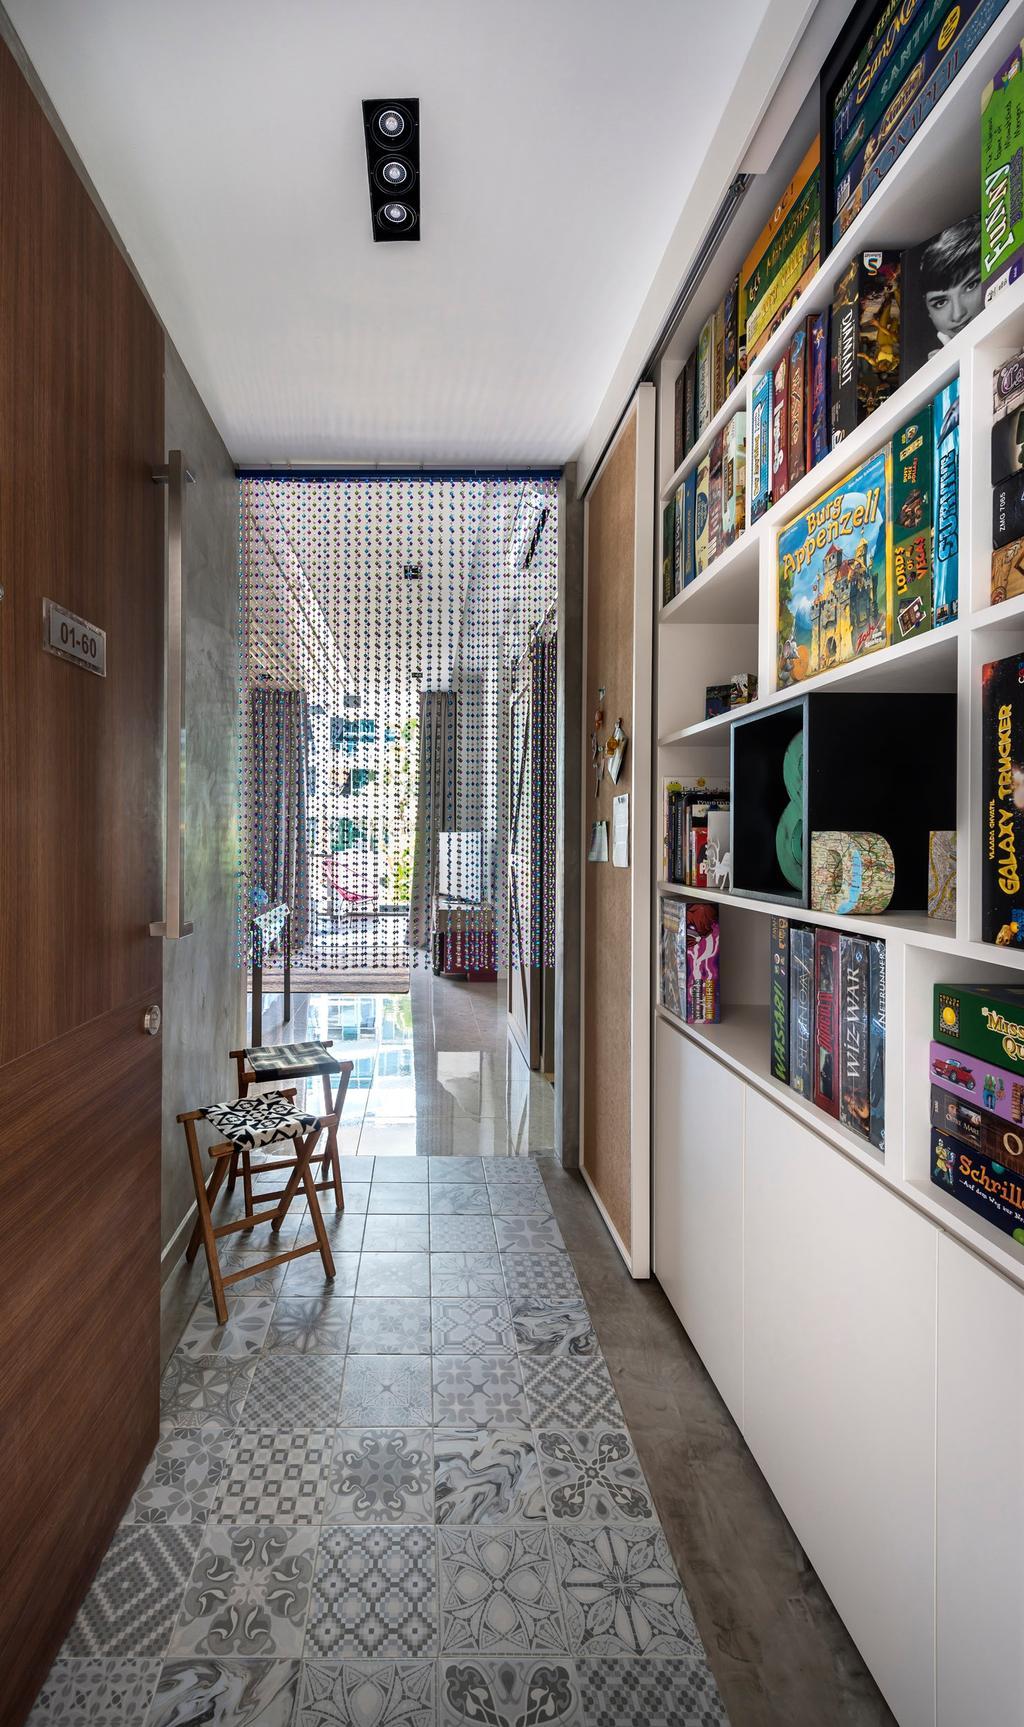 Eclectic, Condo, Canberra Residence, Interior Designer, Prozfile Design, Tile, Tiles, Bookcase, Bookshelf, Shelf, Shelves, Cabinet, Stools, White, Indented Lighting, Recessed Lighting, Bar Stool, Furniture, Chair, Collage, Poster